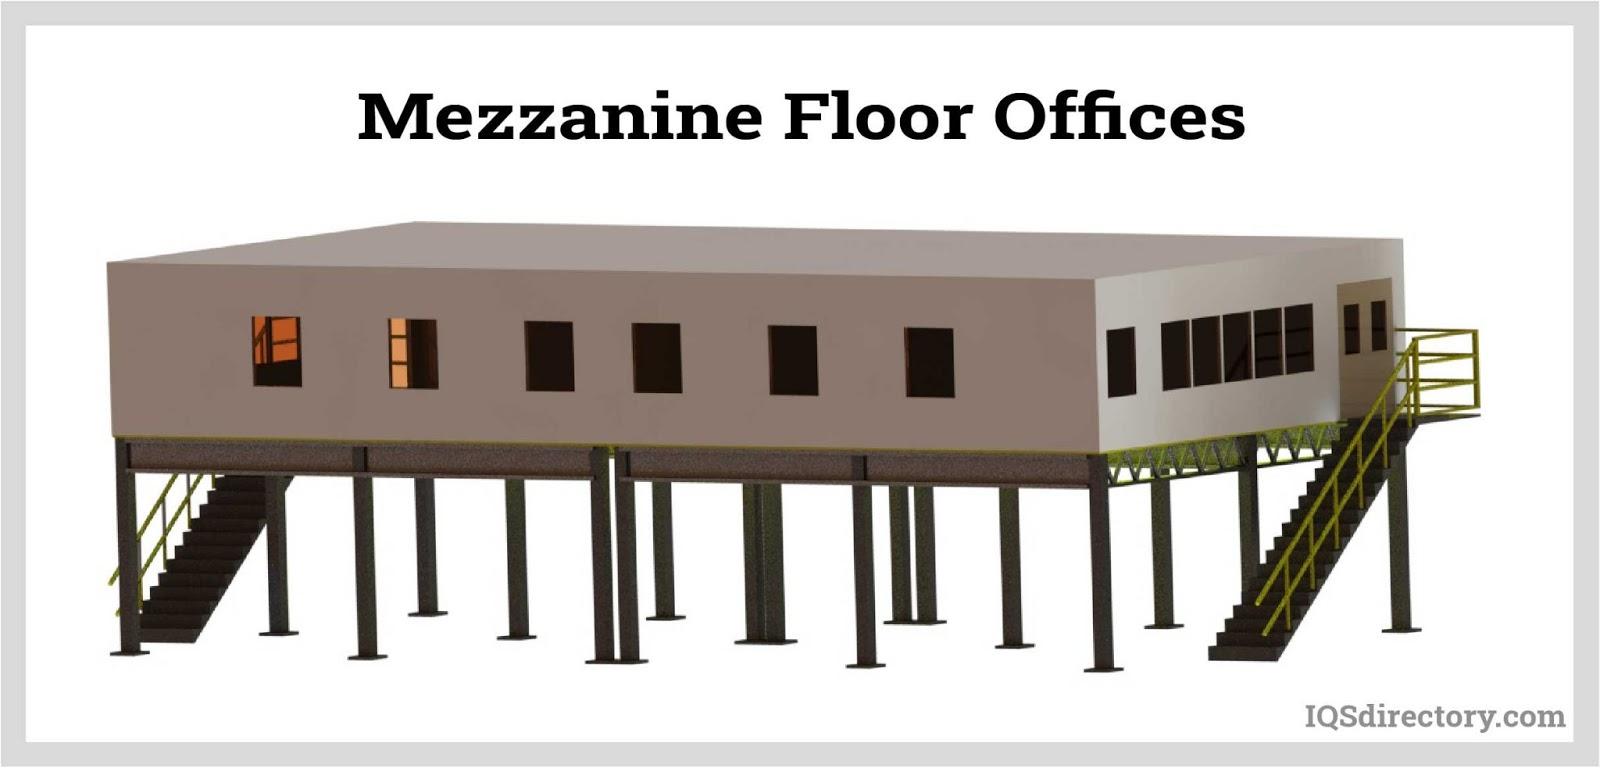 Mezzanine Floor Offices